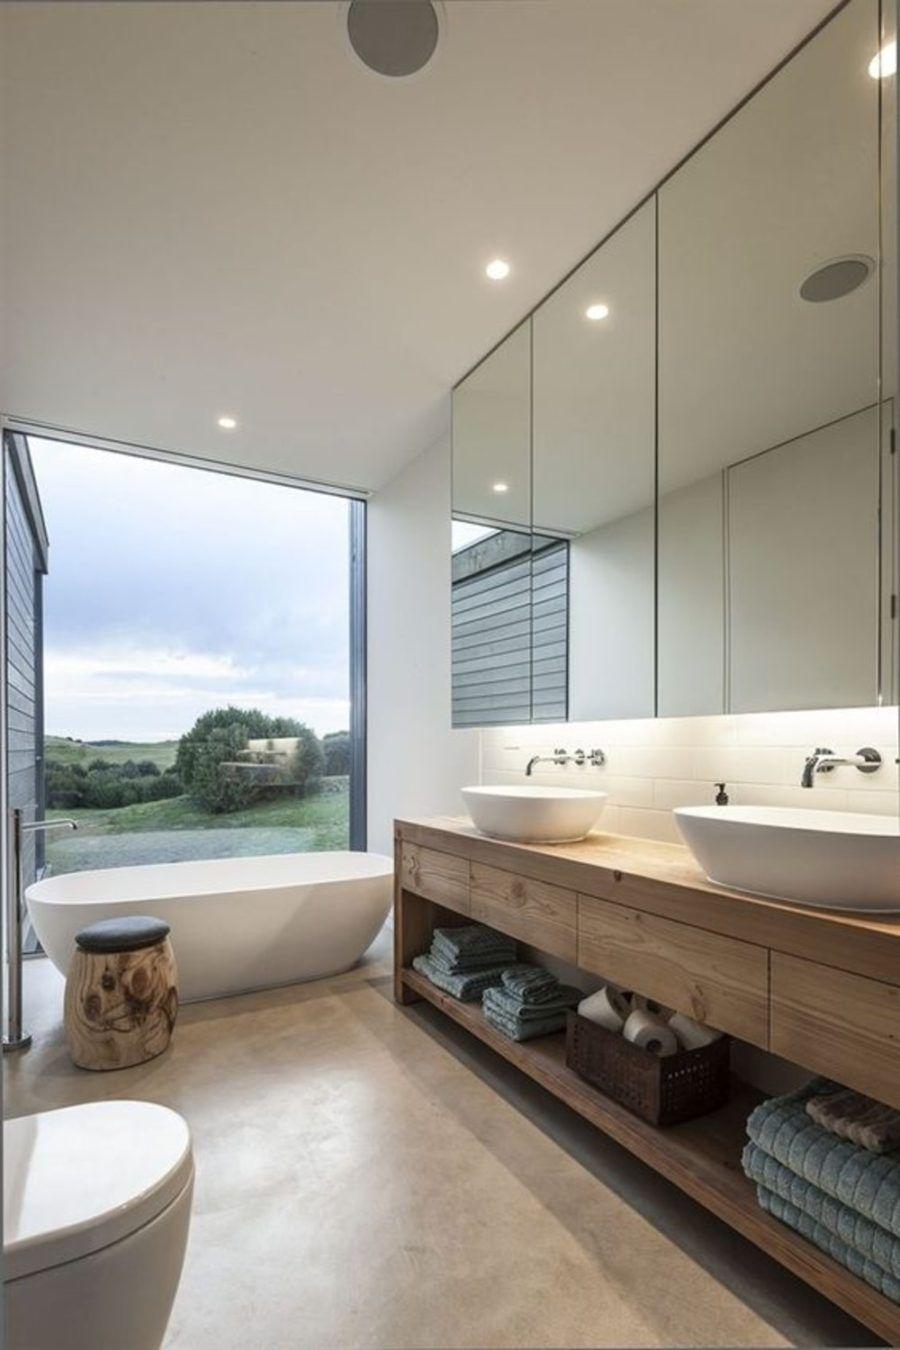 Big Bathroom Mirror Trend In Real Interiors Modern Bathroom